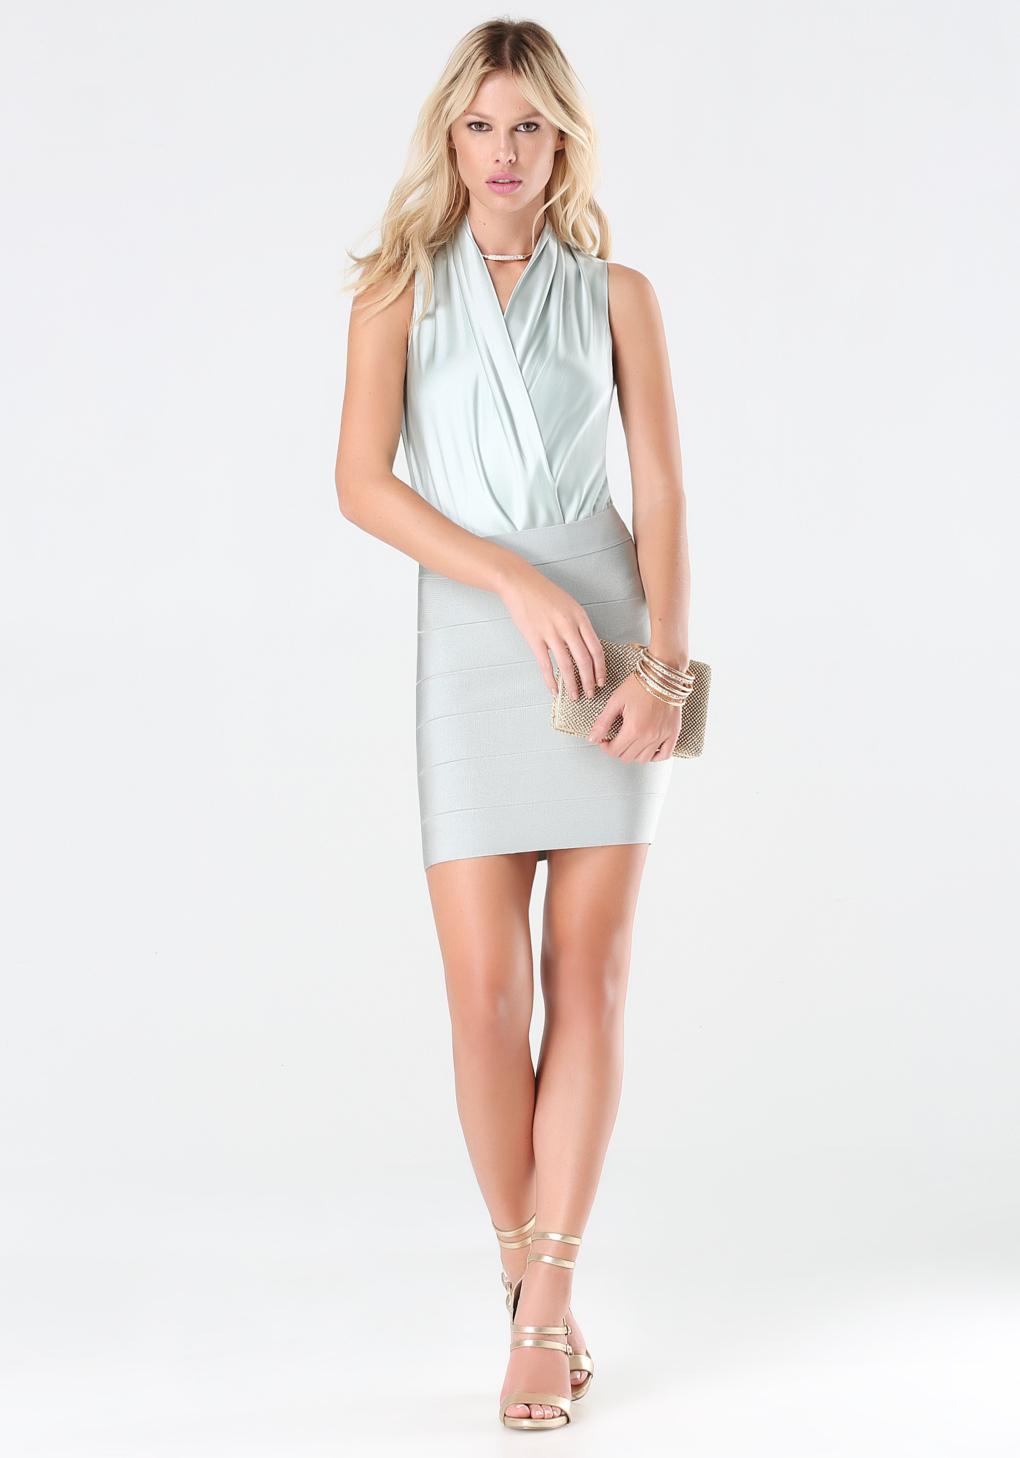 Lyst - Bebe Silk Sleeveless Bodysuit in Blue f91e6d3d1